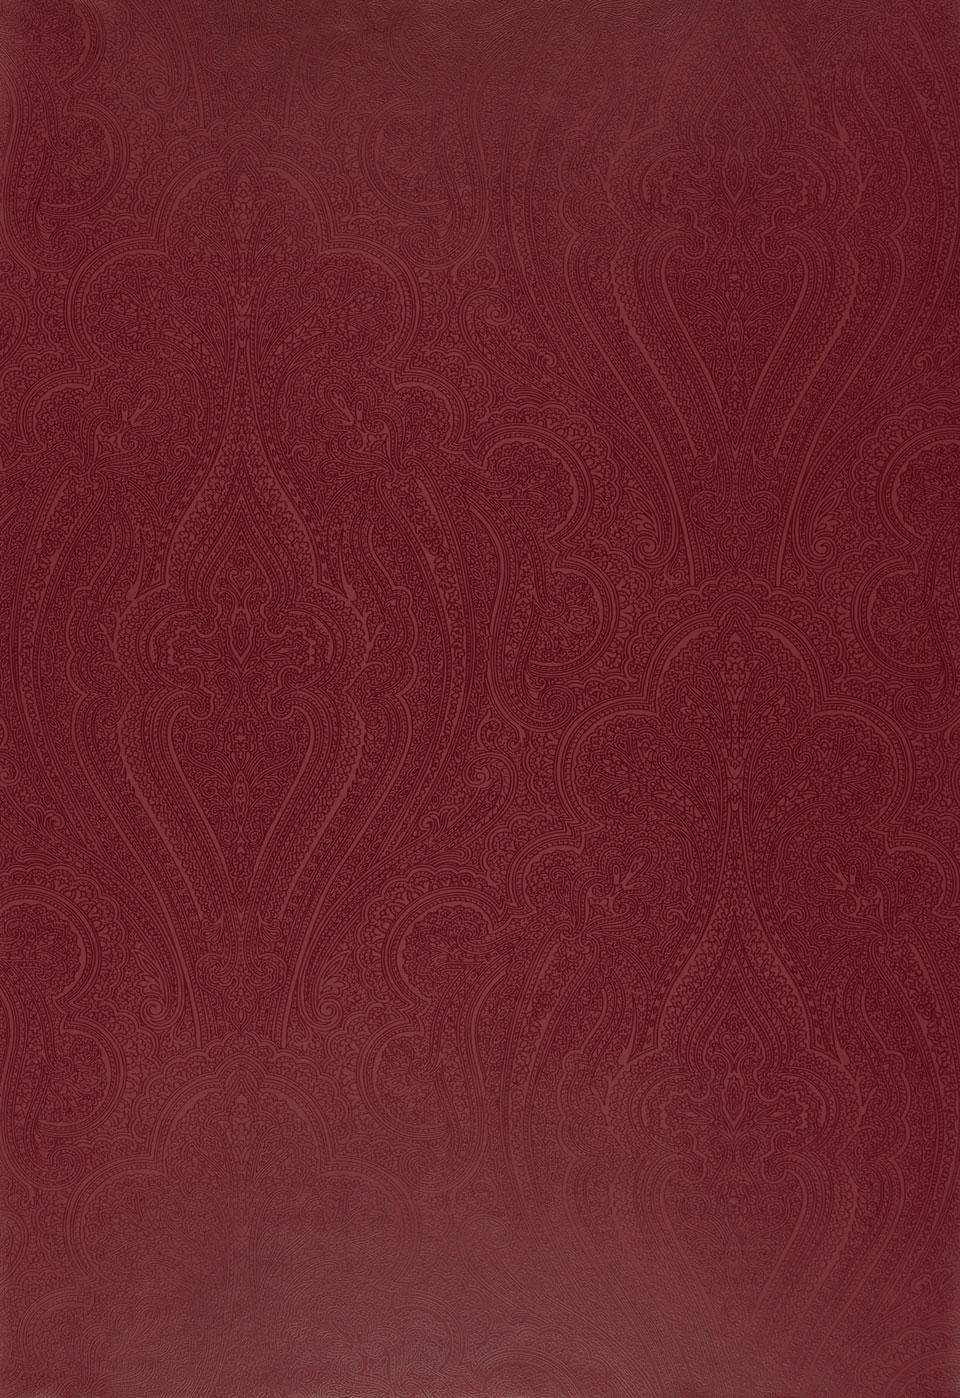 Американские обои Schumacher,  коллекция Luxe Lodge, артикул5006240